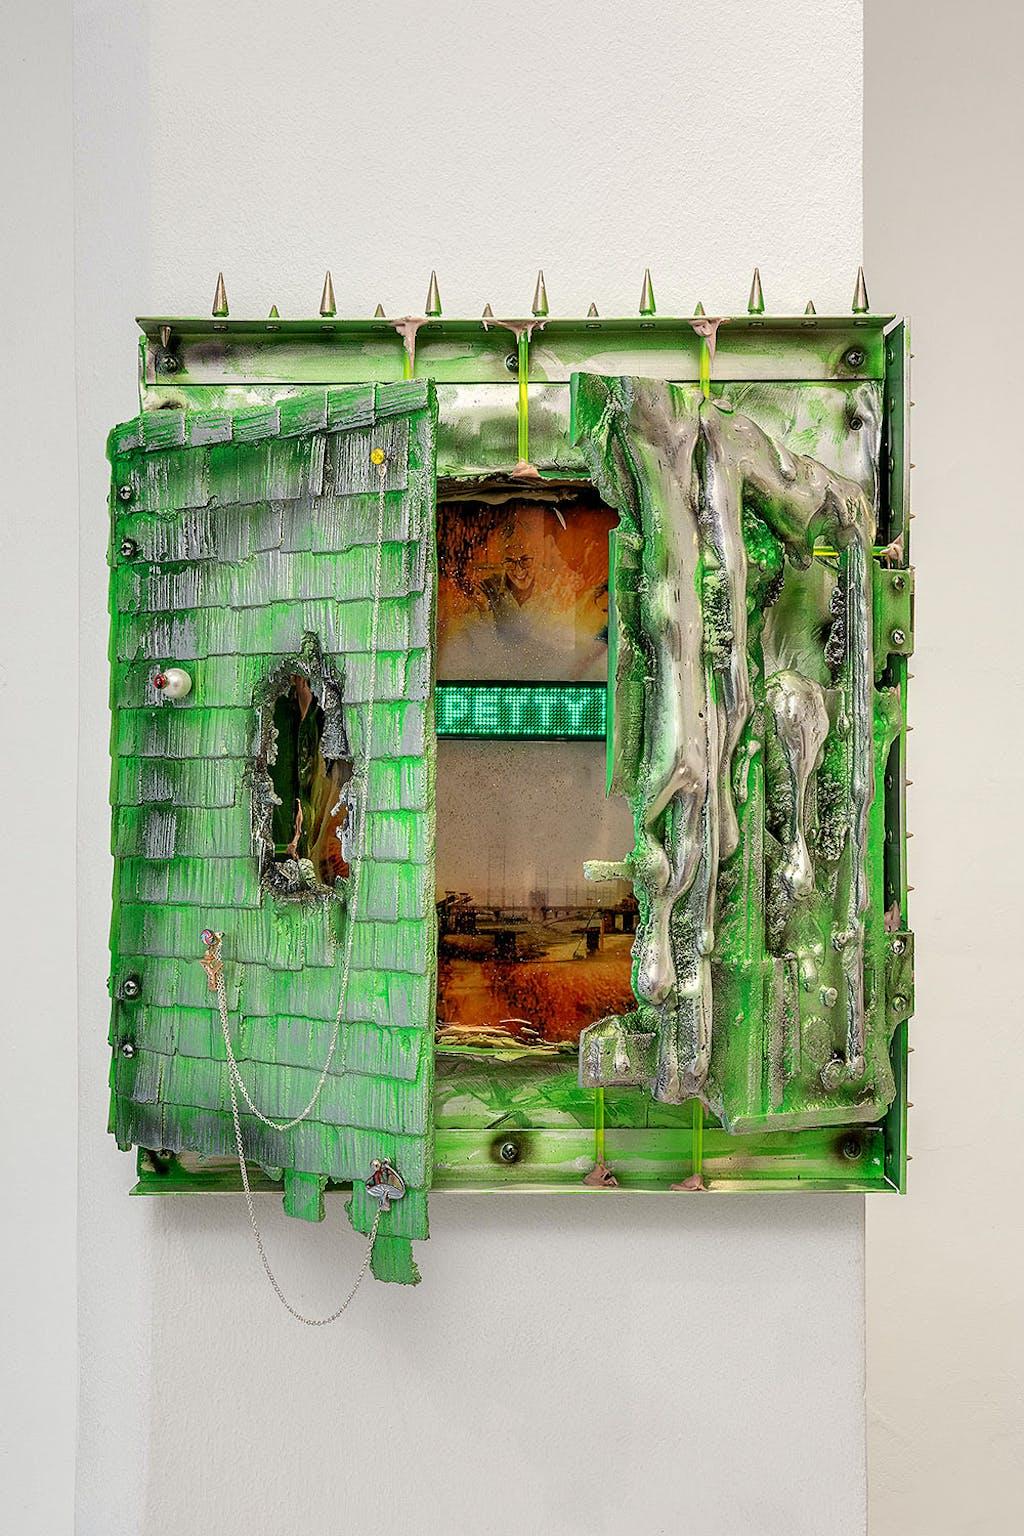 FITZPATRICK GALLERY - © Paris Internationale